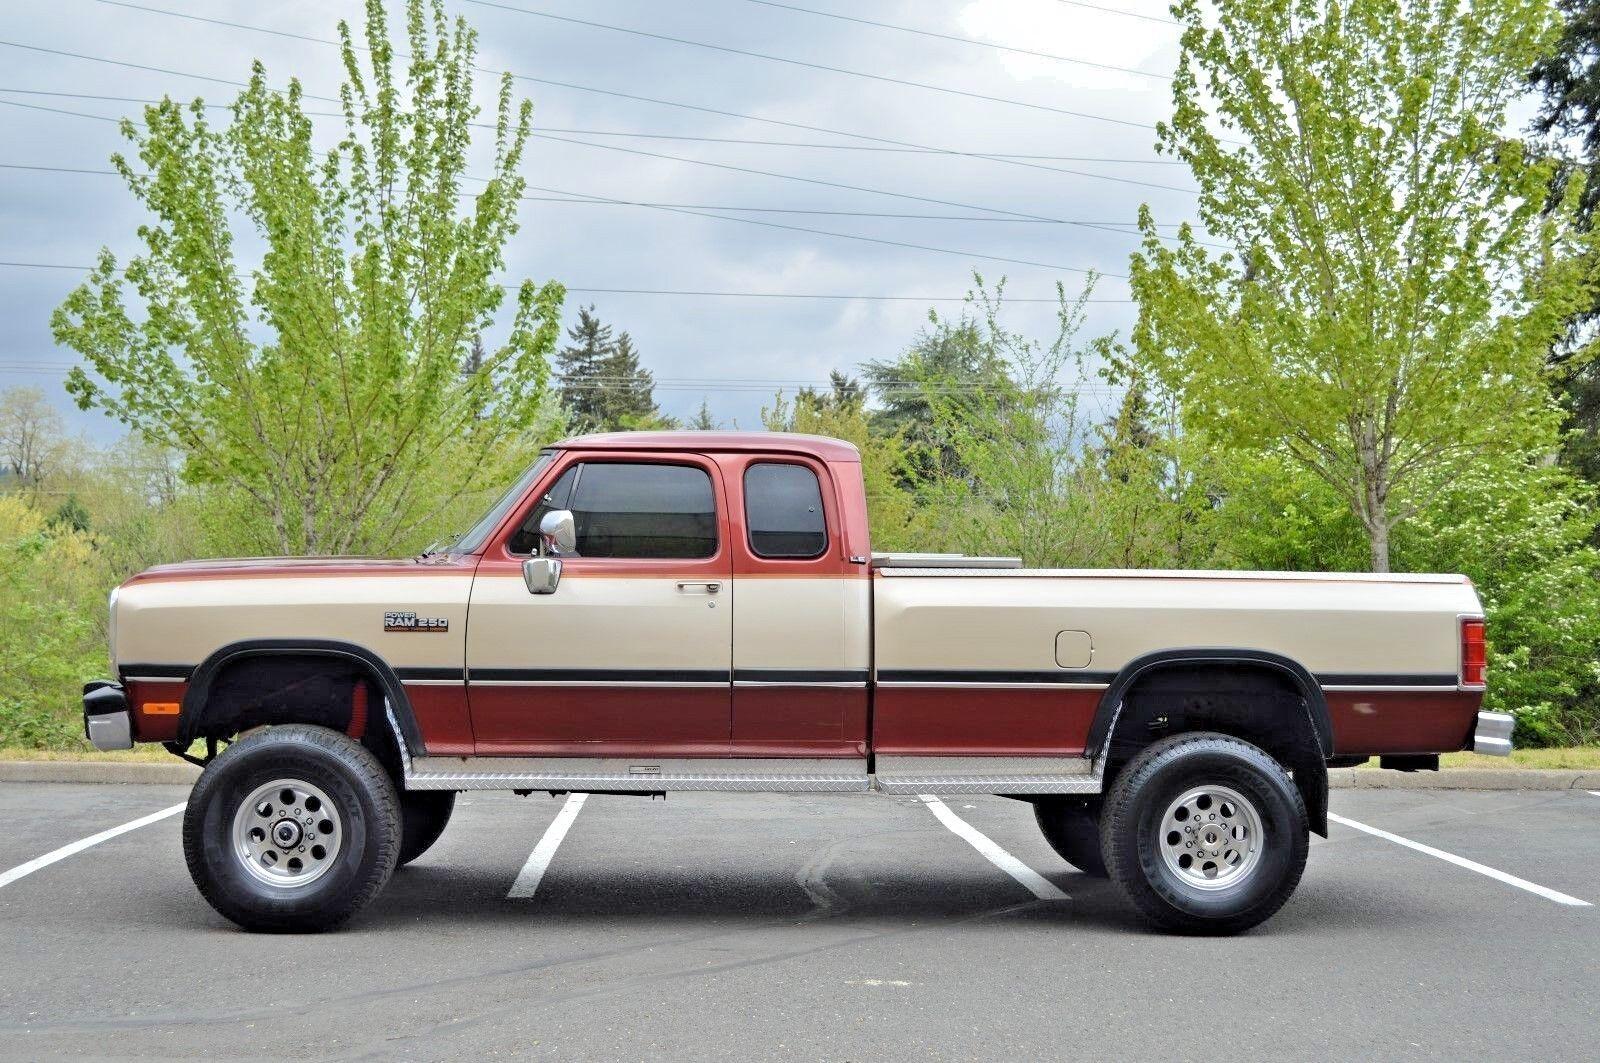 1993 Dodge Ram W250 Le 4x4 12 Valve 5 9 Cummins Diesel